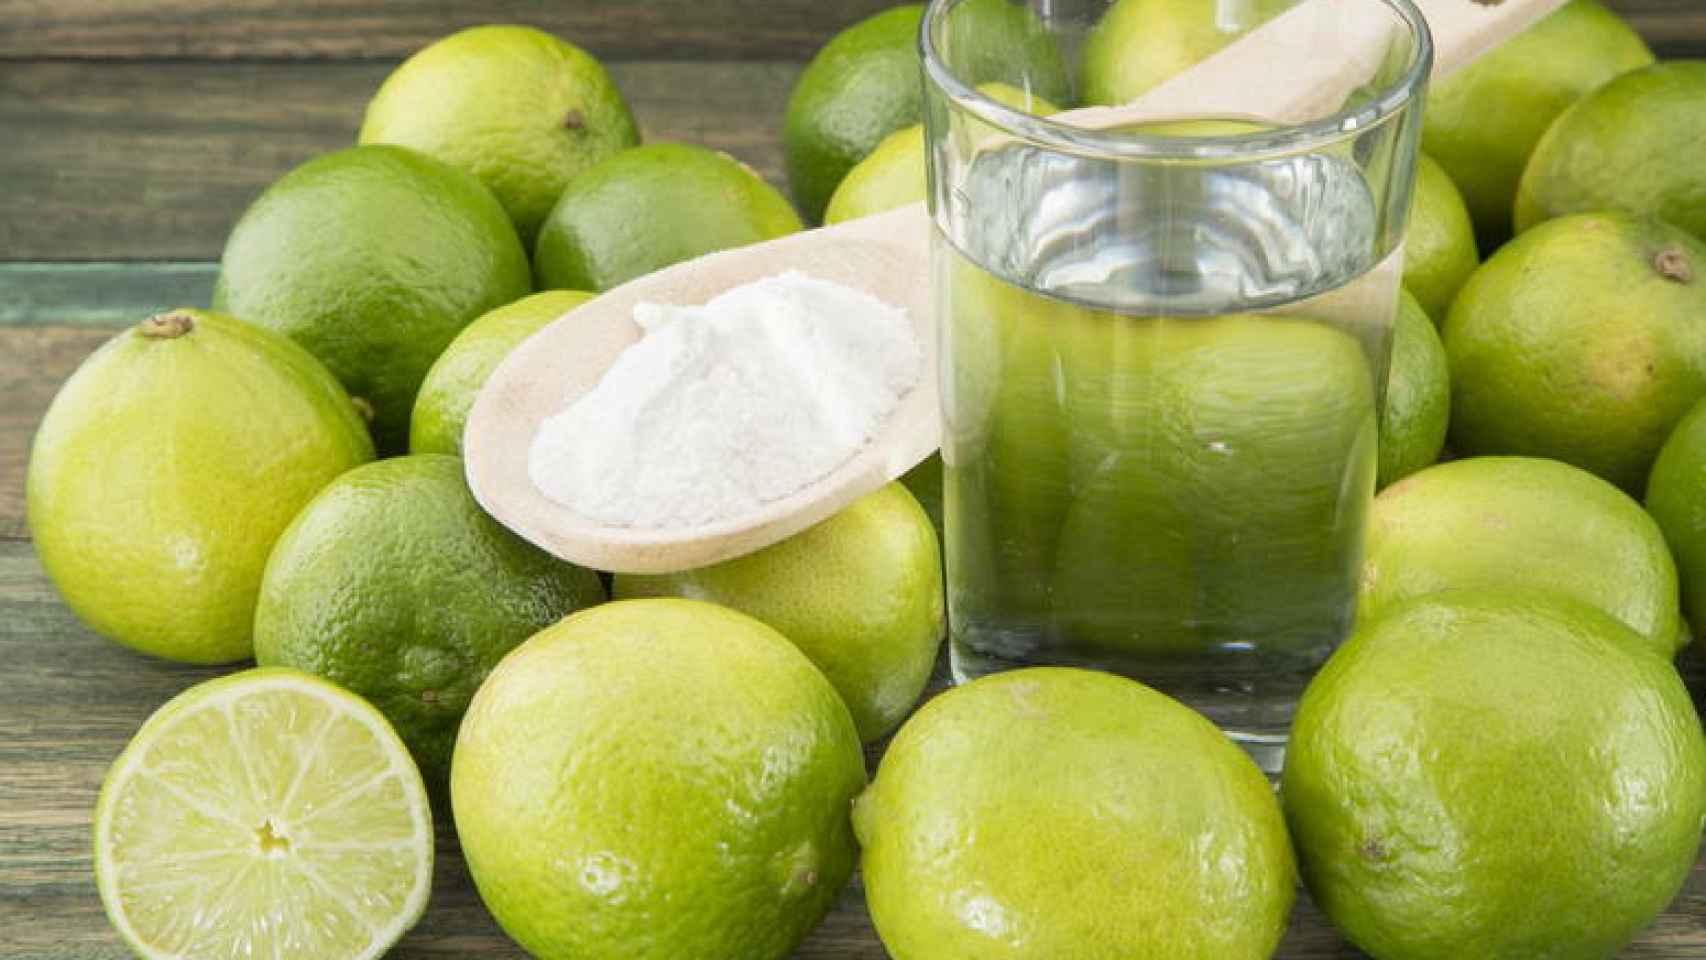 Bicarbonato Con Limón Para Adelgazar Radiografía De Un Remedio Malicioso Sin Sentido